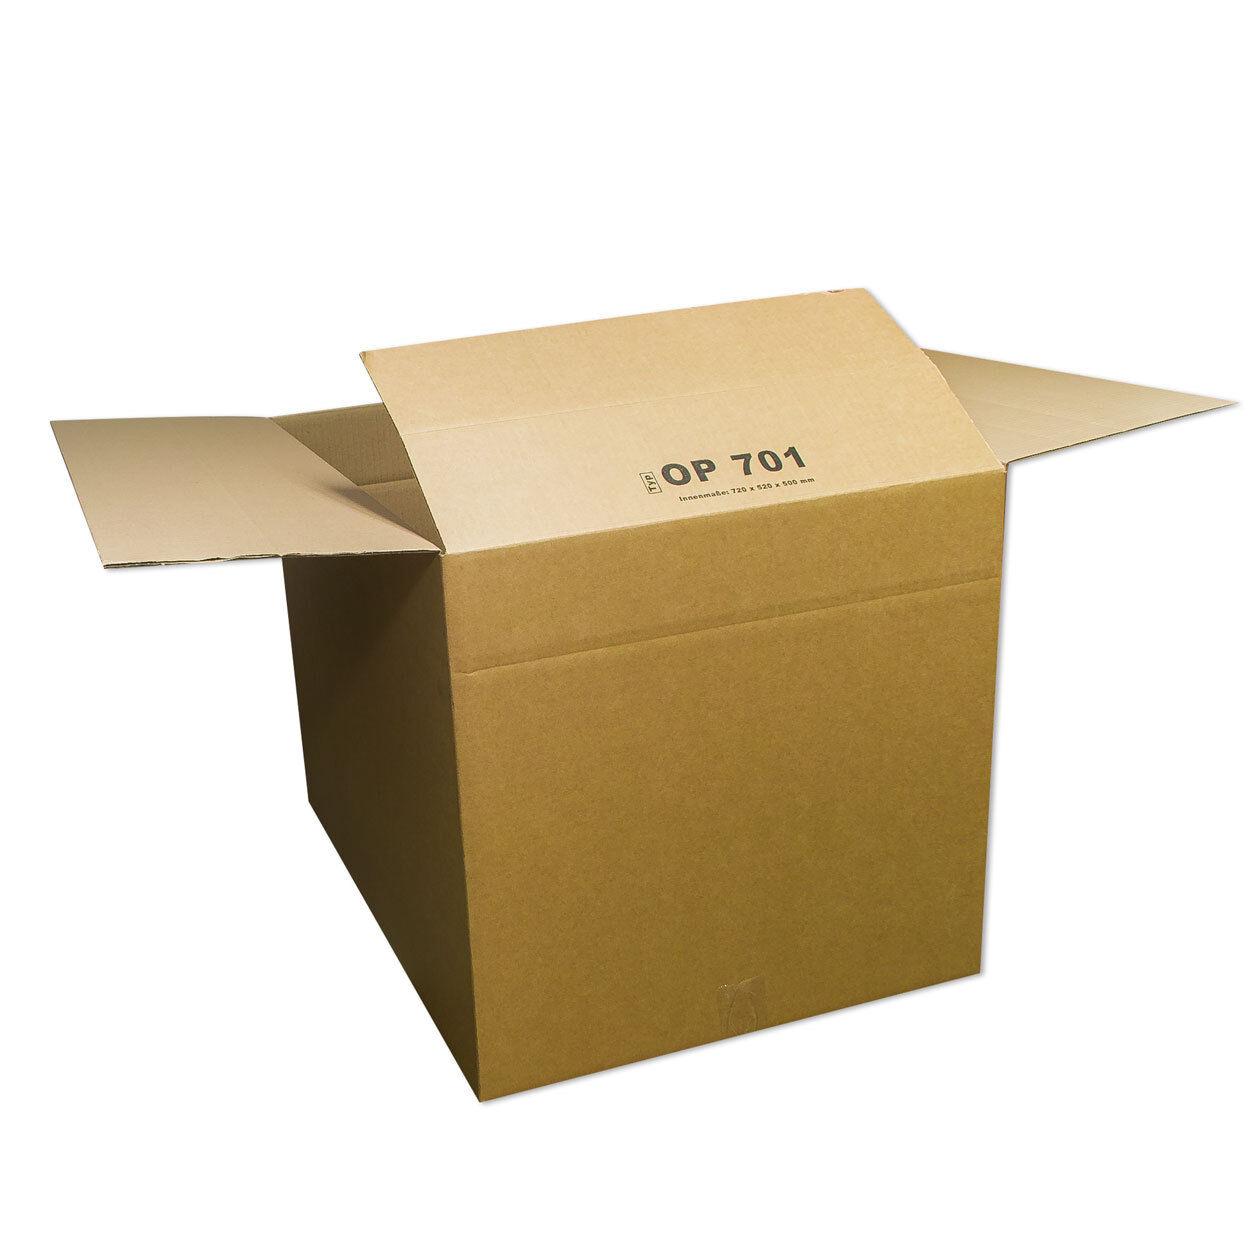 10 Kartons 500x500x500mm Faltkarton Paket Verpackungskarton Post Schachtel